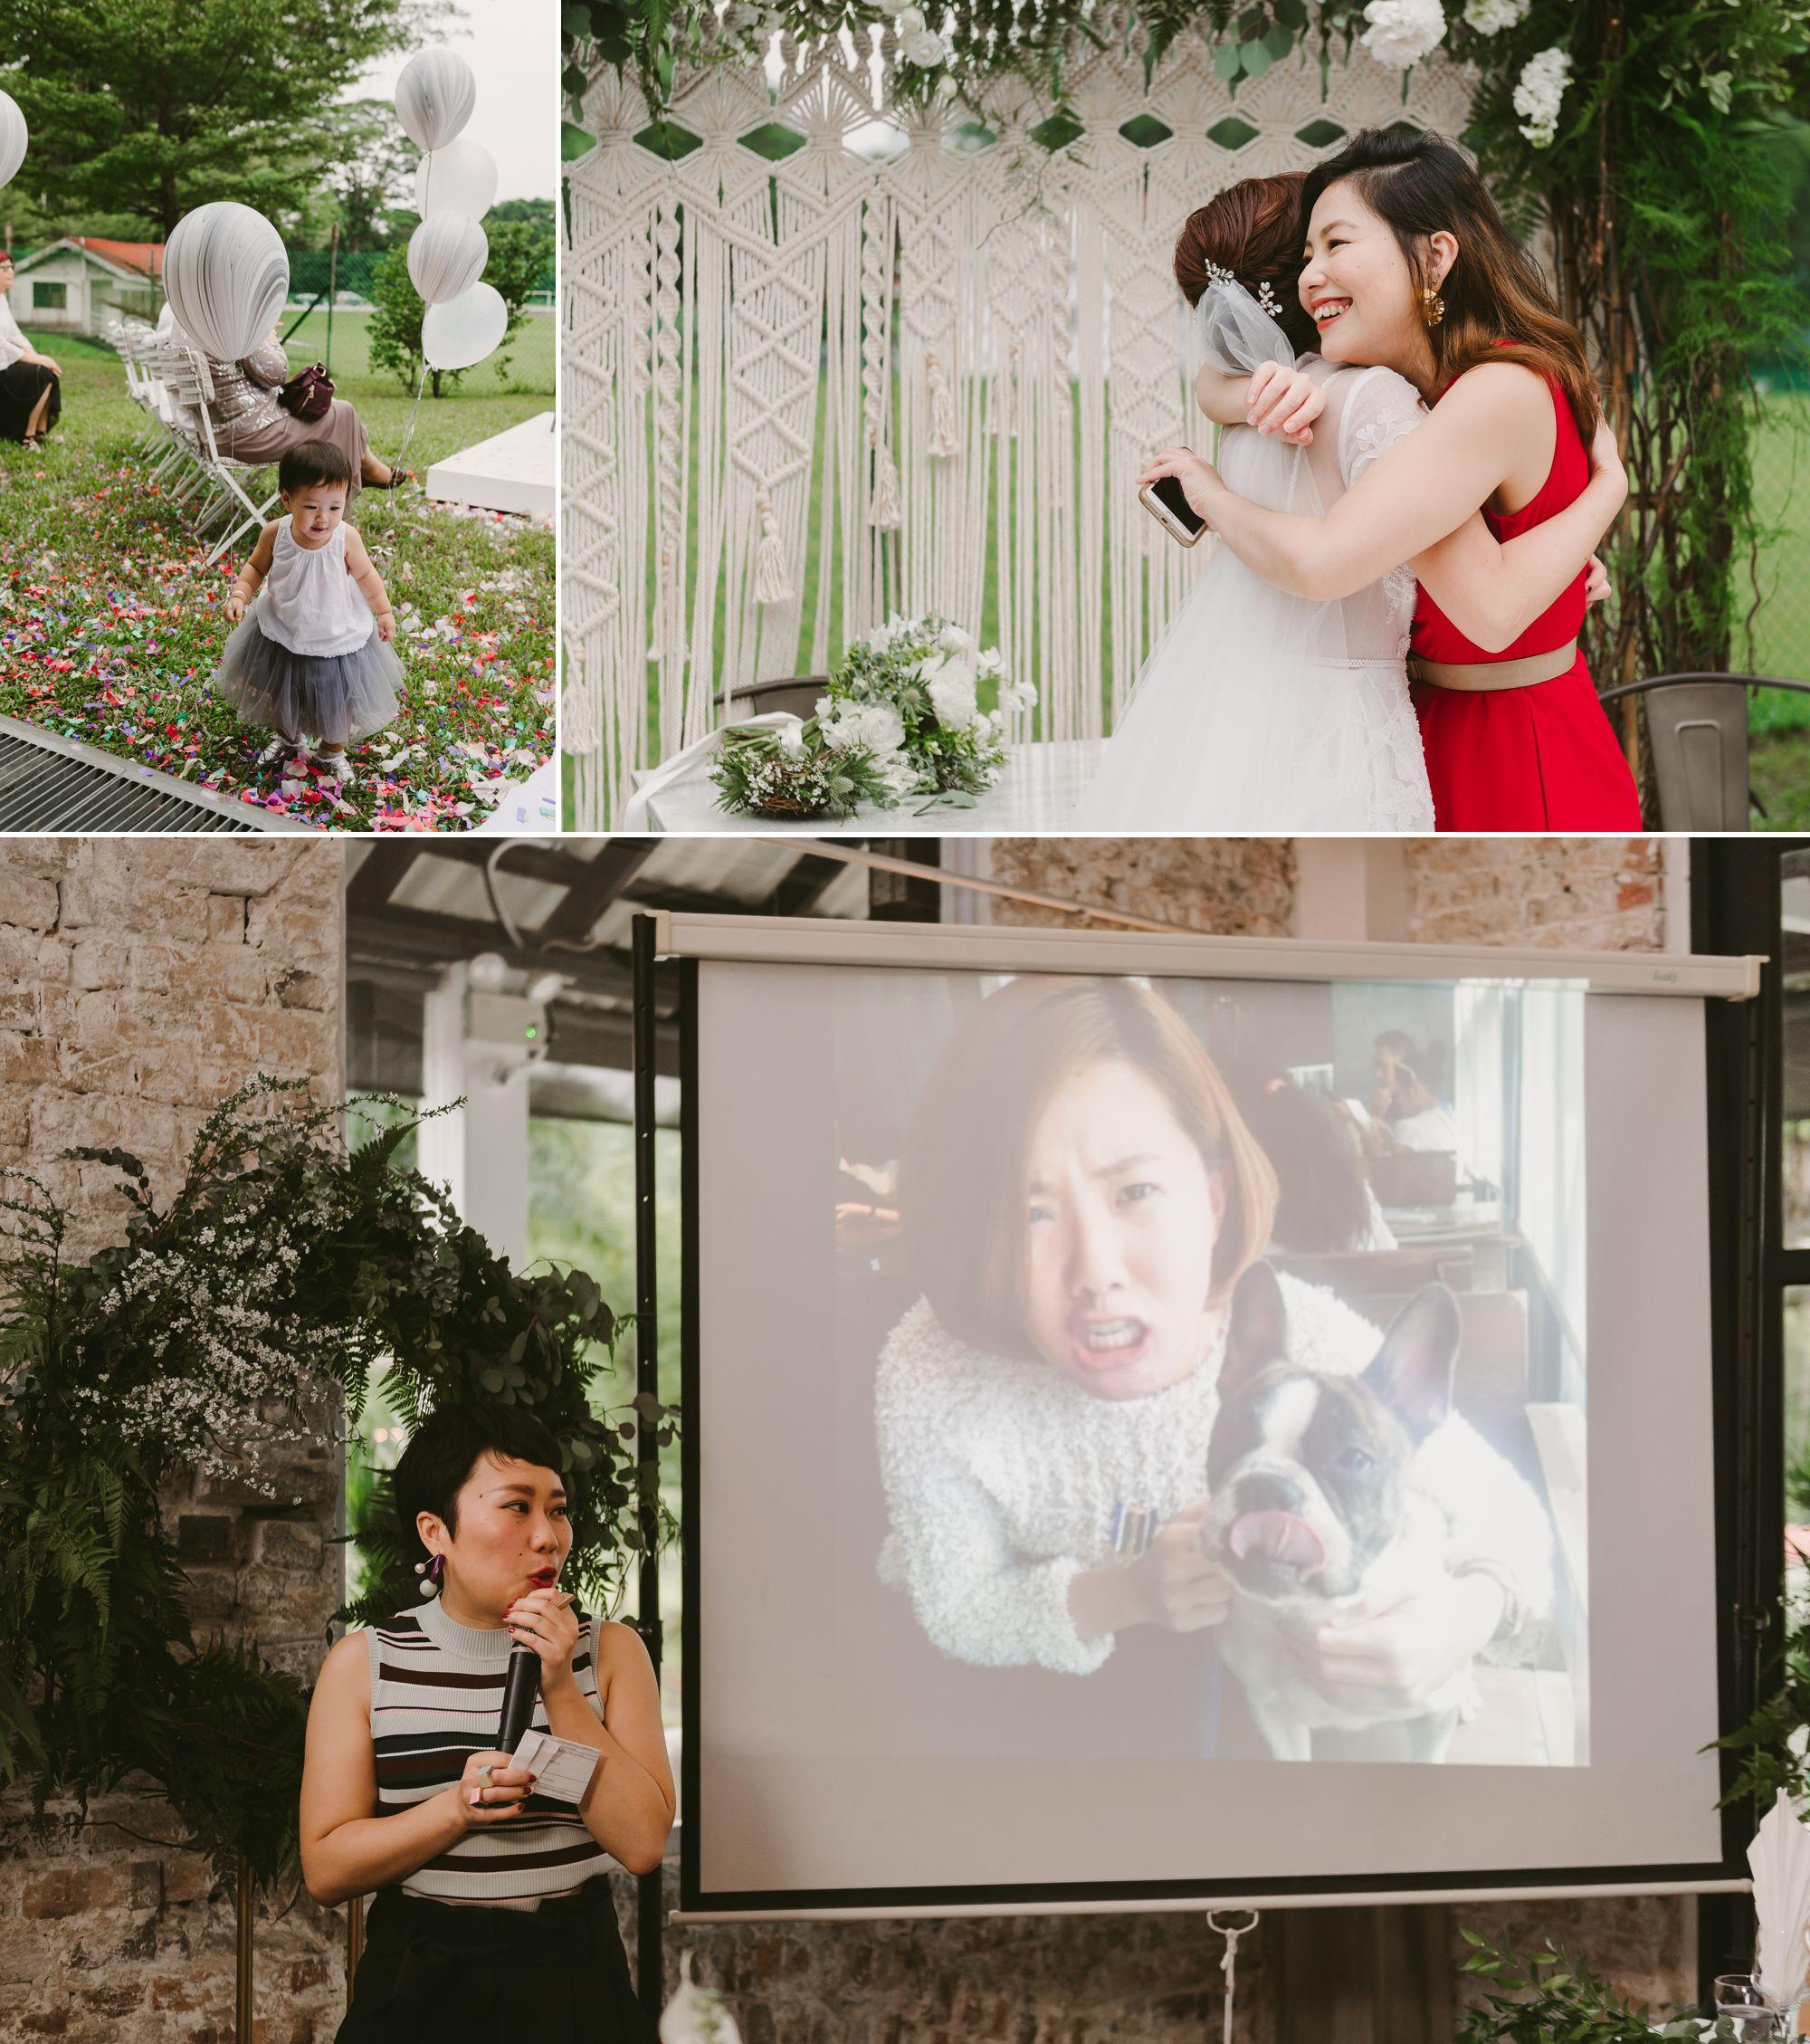 wedding_photography 27.jpg